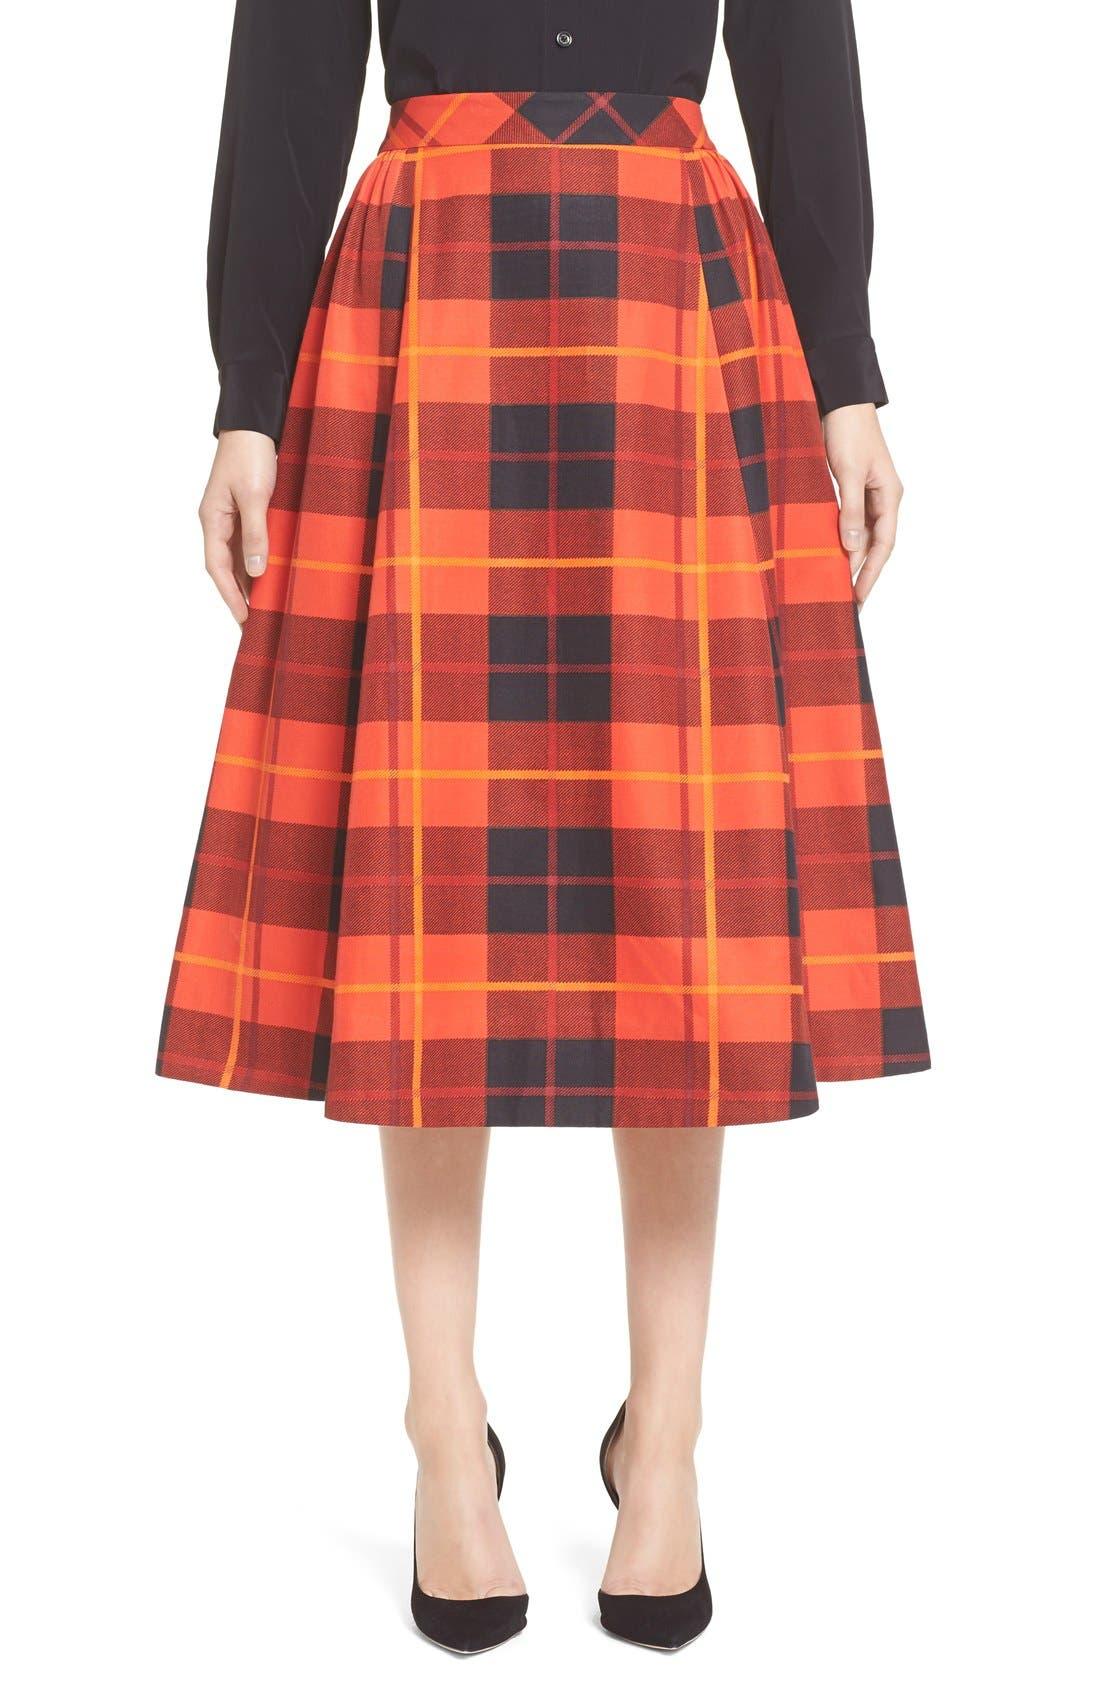 KATE SPADE NEW YORK,                             katespade new yorkwoodland plaid midi skirt,                             Main thumbnail 1, color,                             601